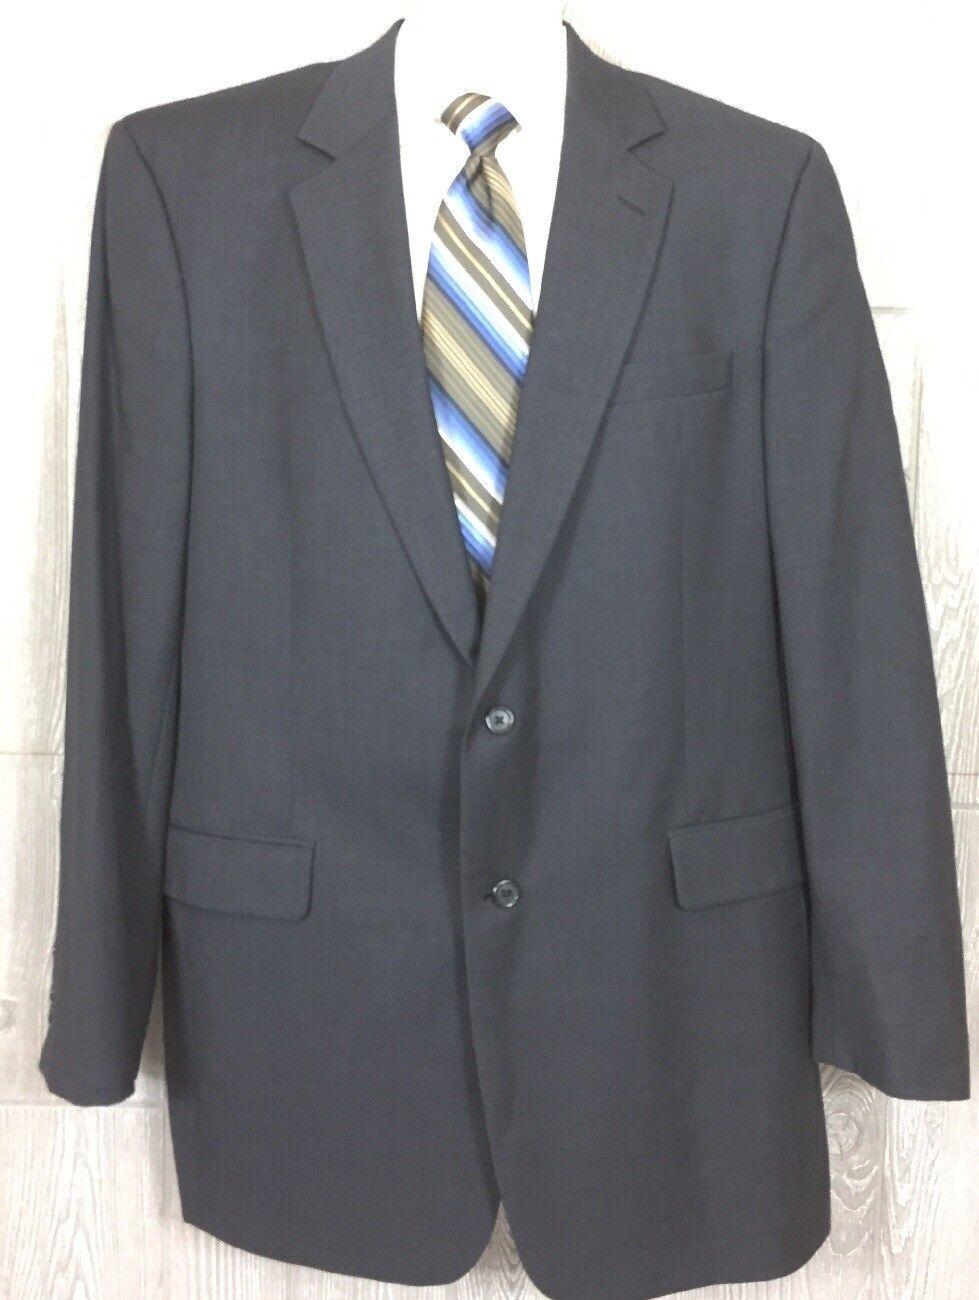 Jos A Bank  Herren Grau/Blau Wool Blazer Sport Coat Sz 44 Extra Long (t8)